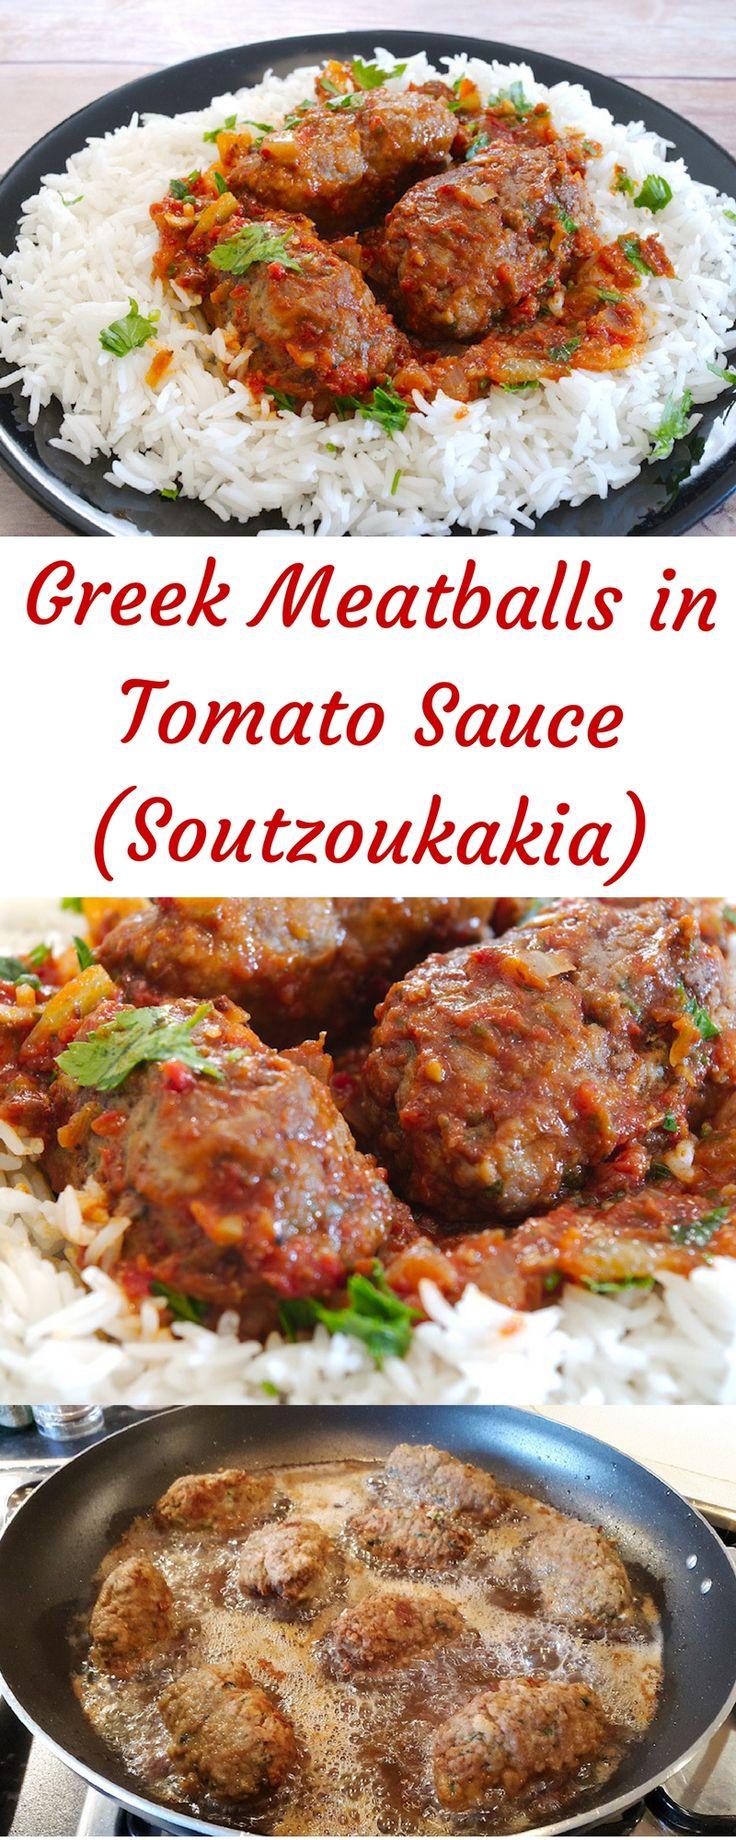 Spicy Greek Meatballs in Tomato sauce (Soutzoukakia)